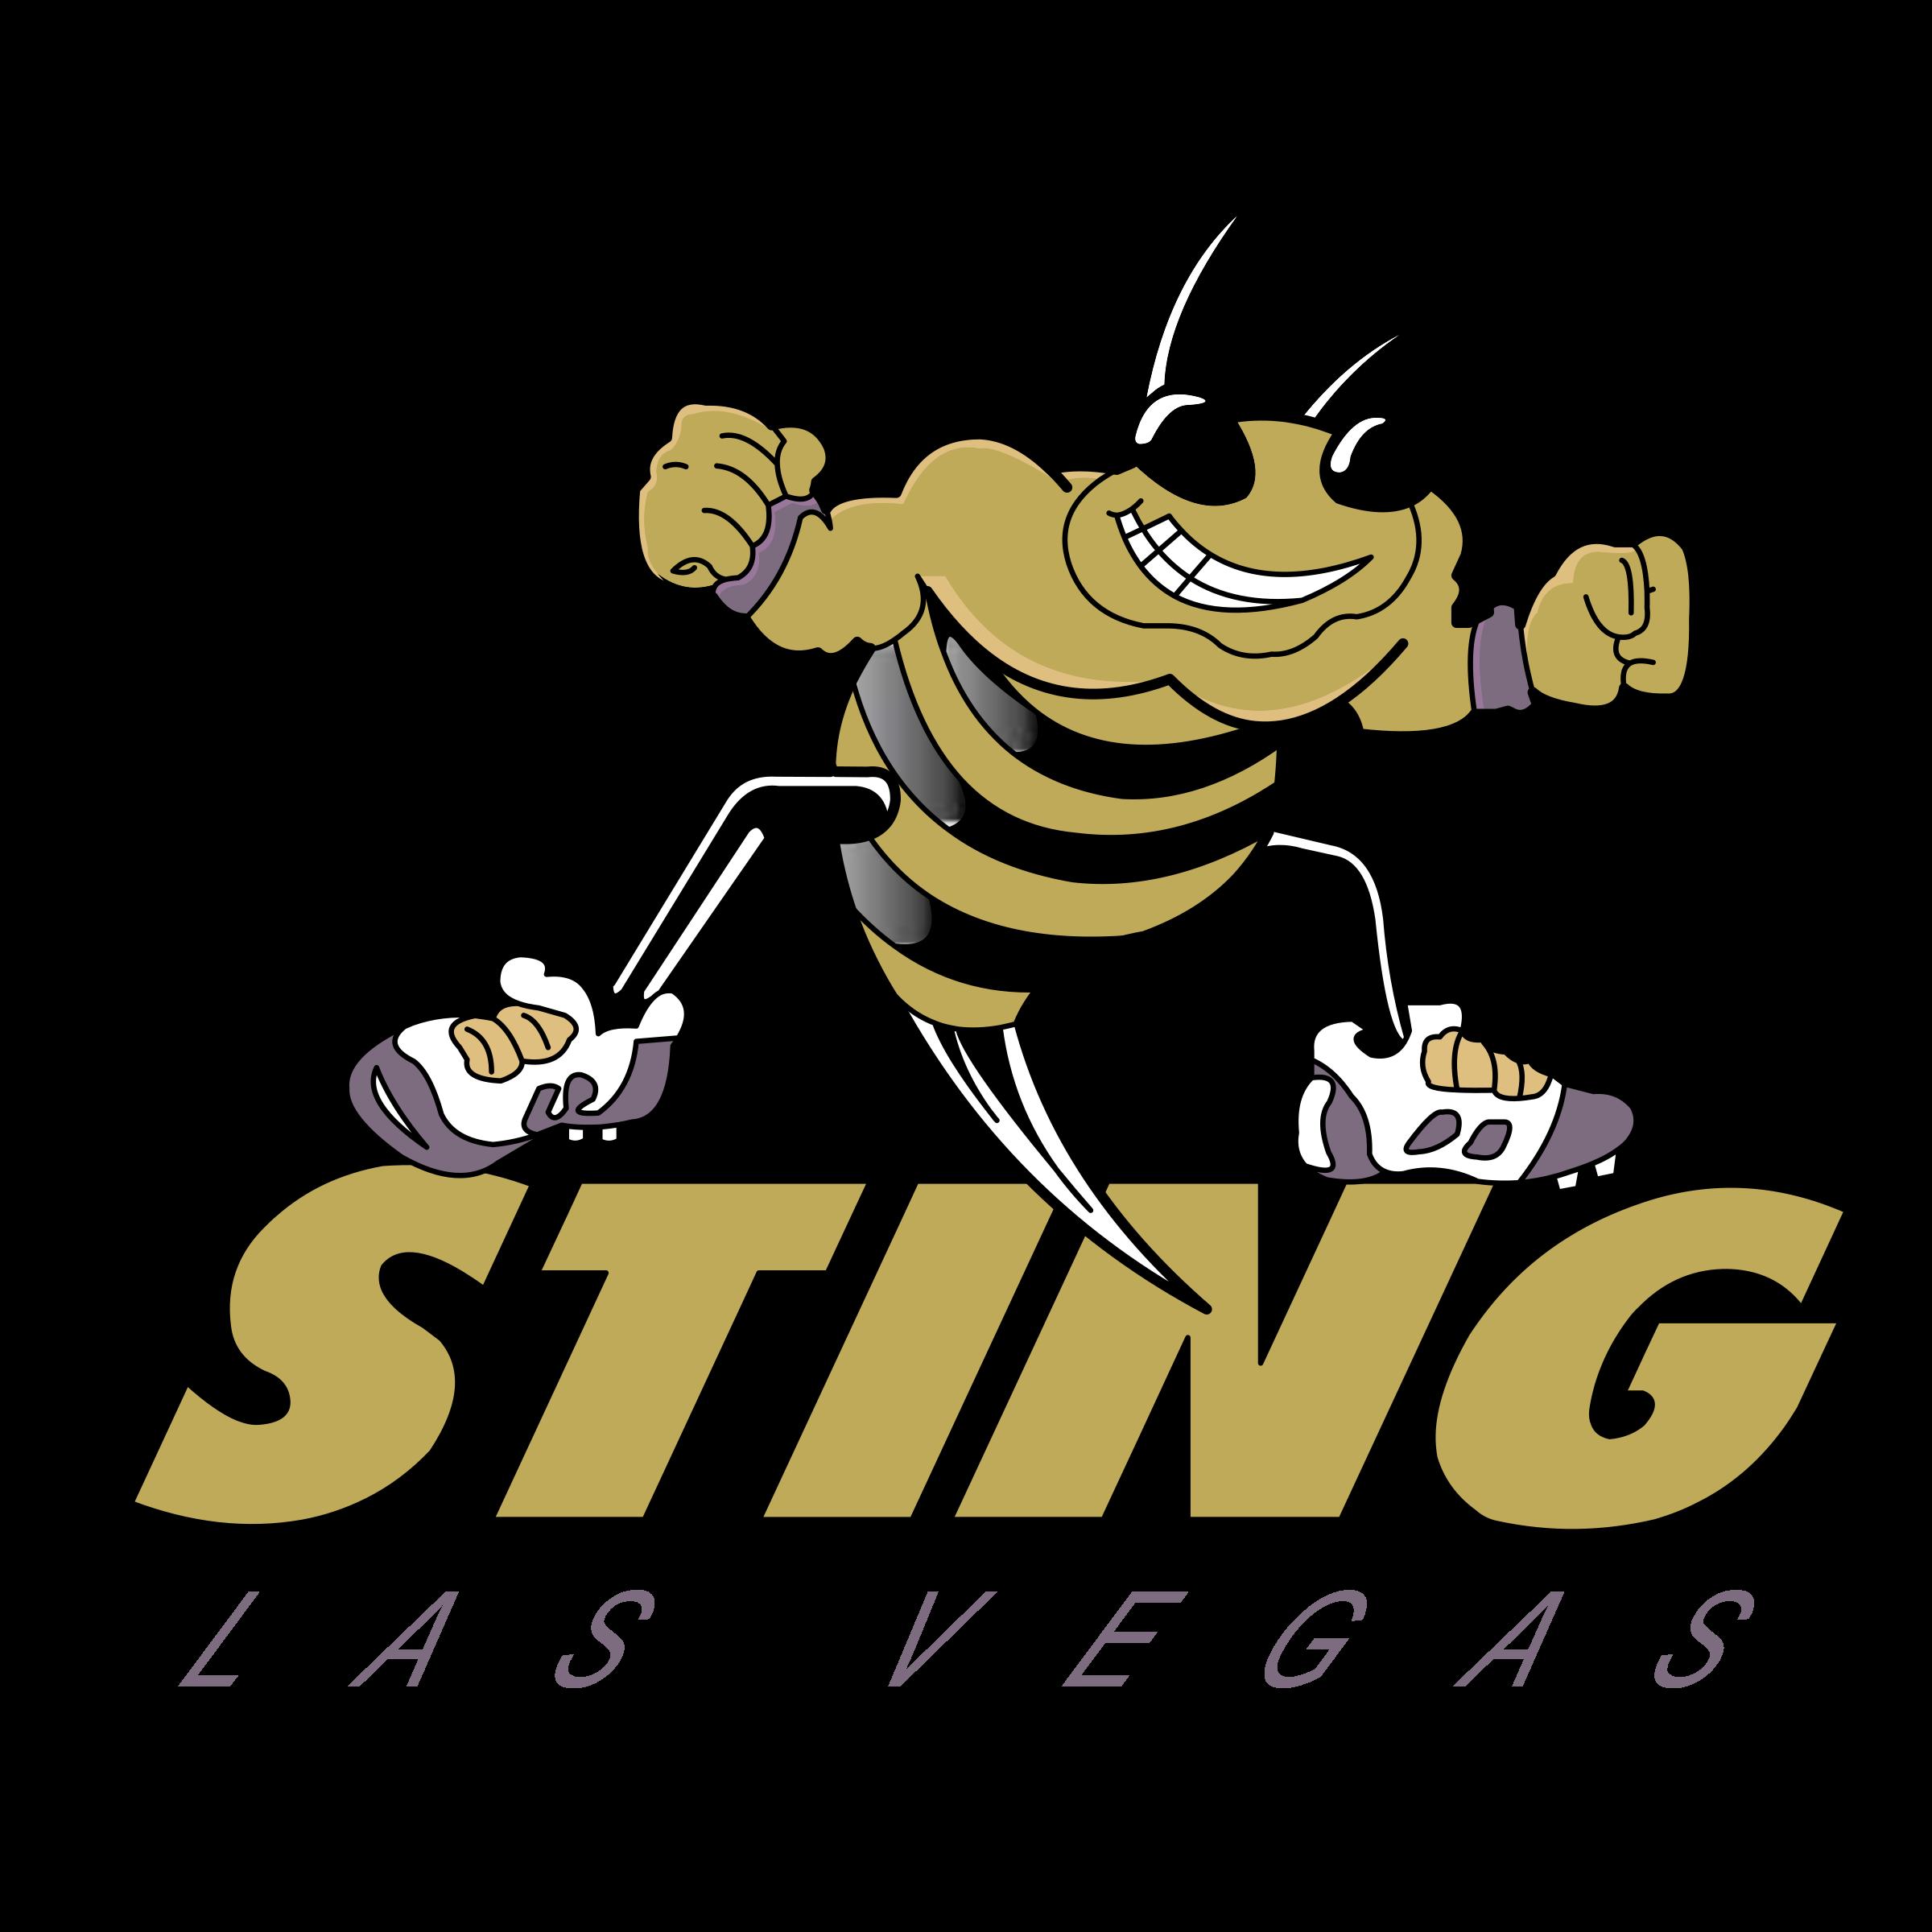 Sting logo png transparent. Las vegas clipart sketch